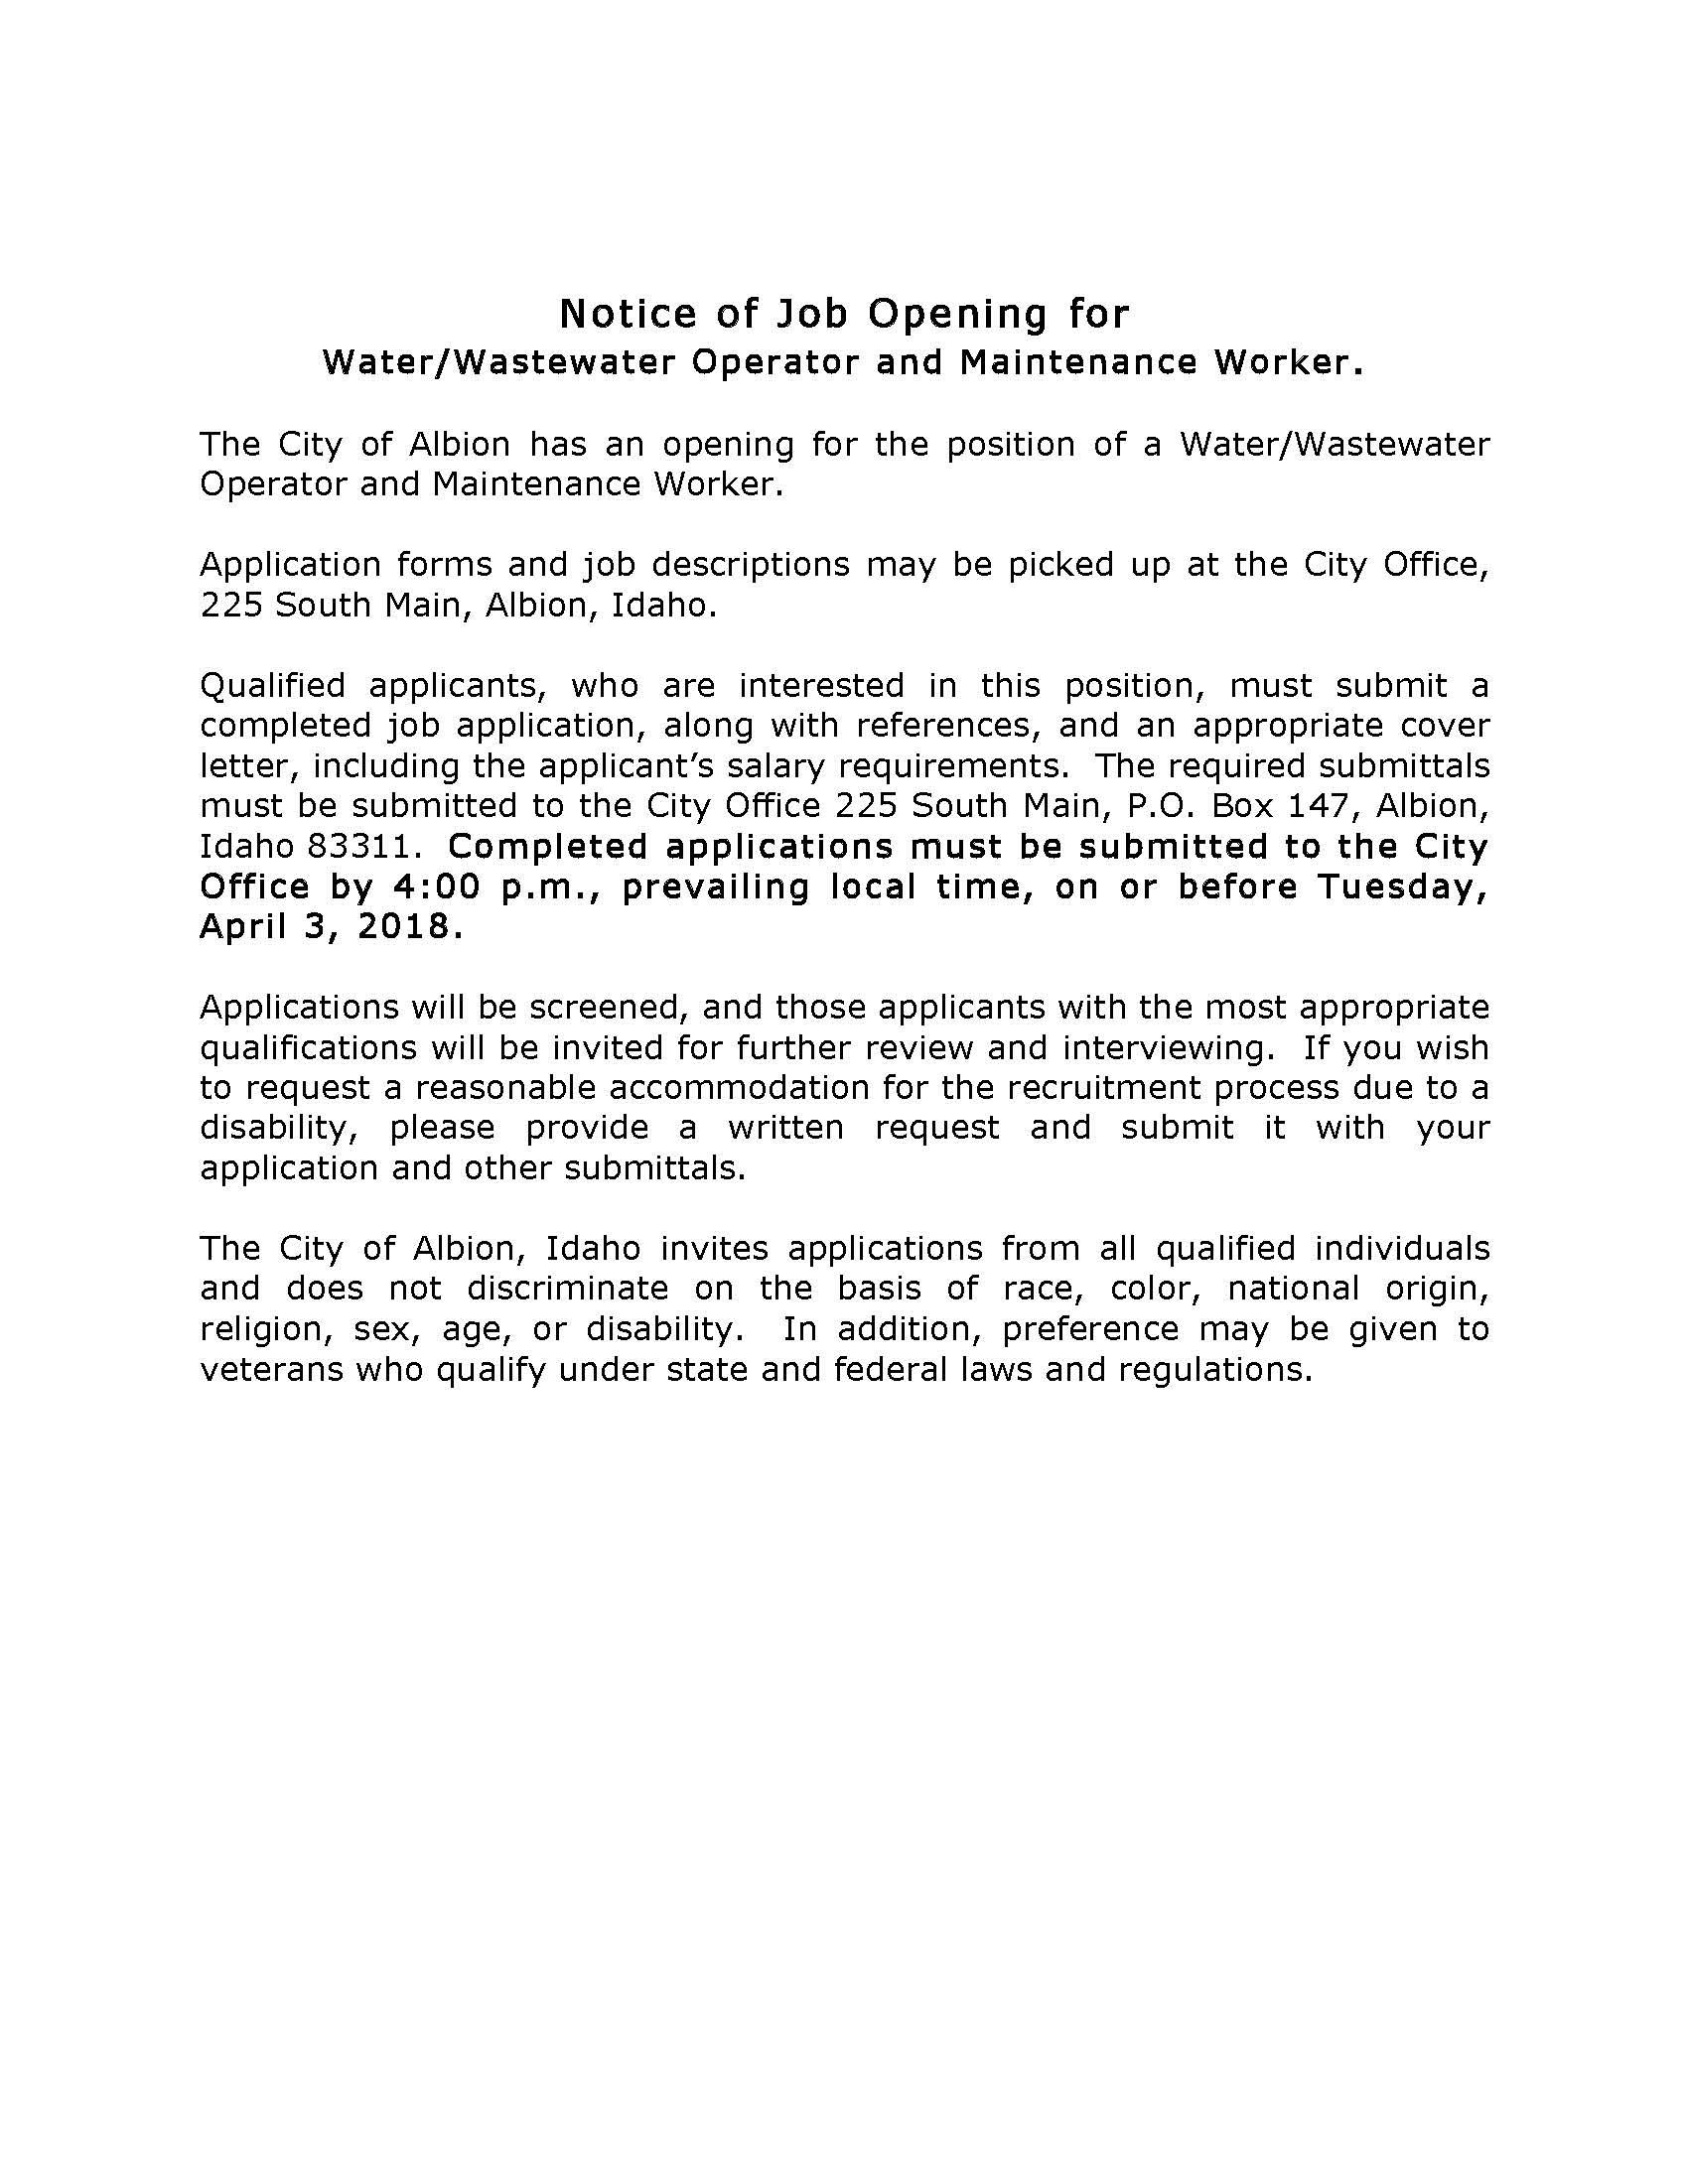 03232018 Notice of Job Opening for Waste Water Maintenance Supervisor.jpg